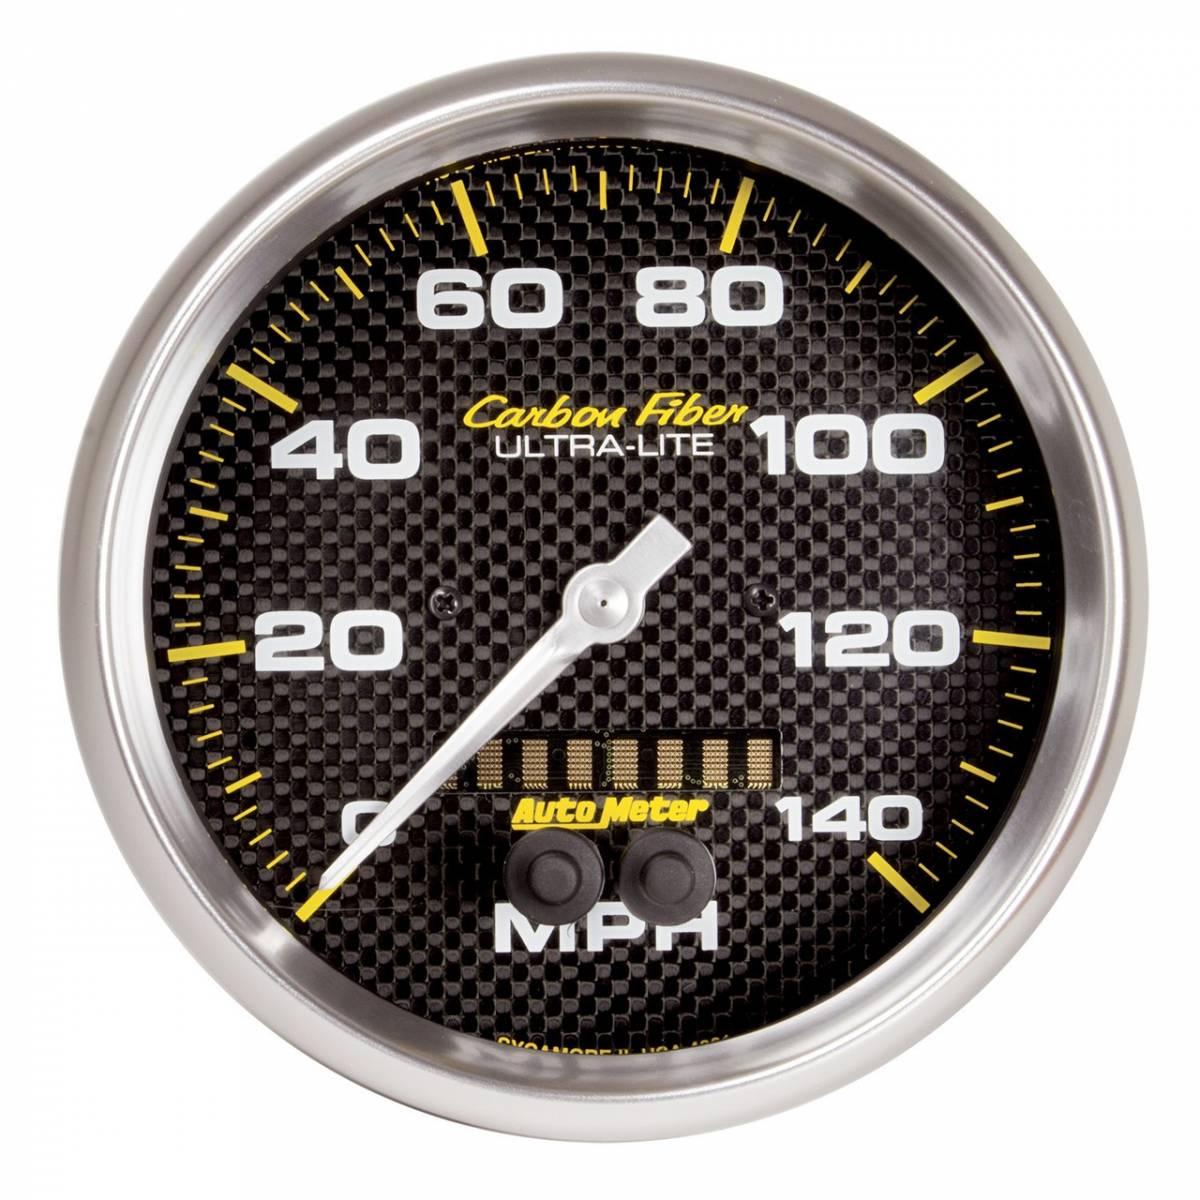 Auto Meter Auto Meter Carbon Fiber 5in  127mm  140 Mph In-dash Full Sweep Gps Speedometer